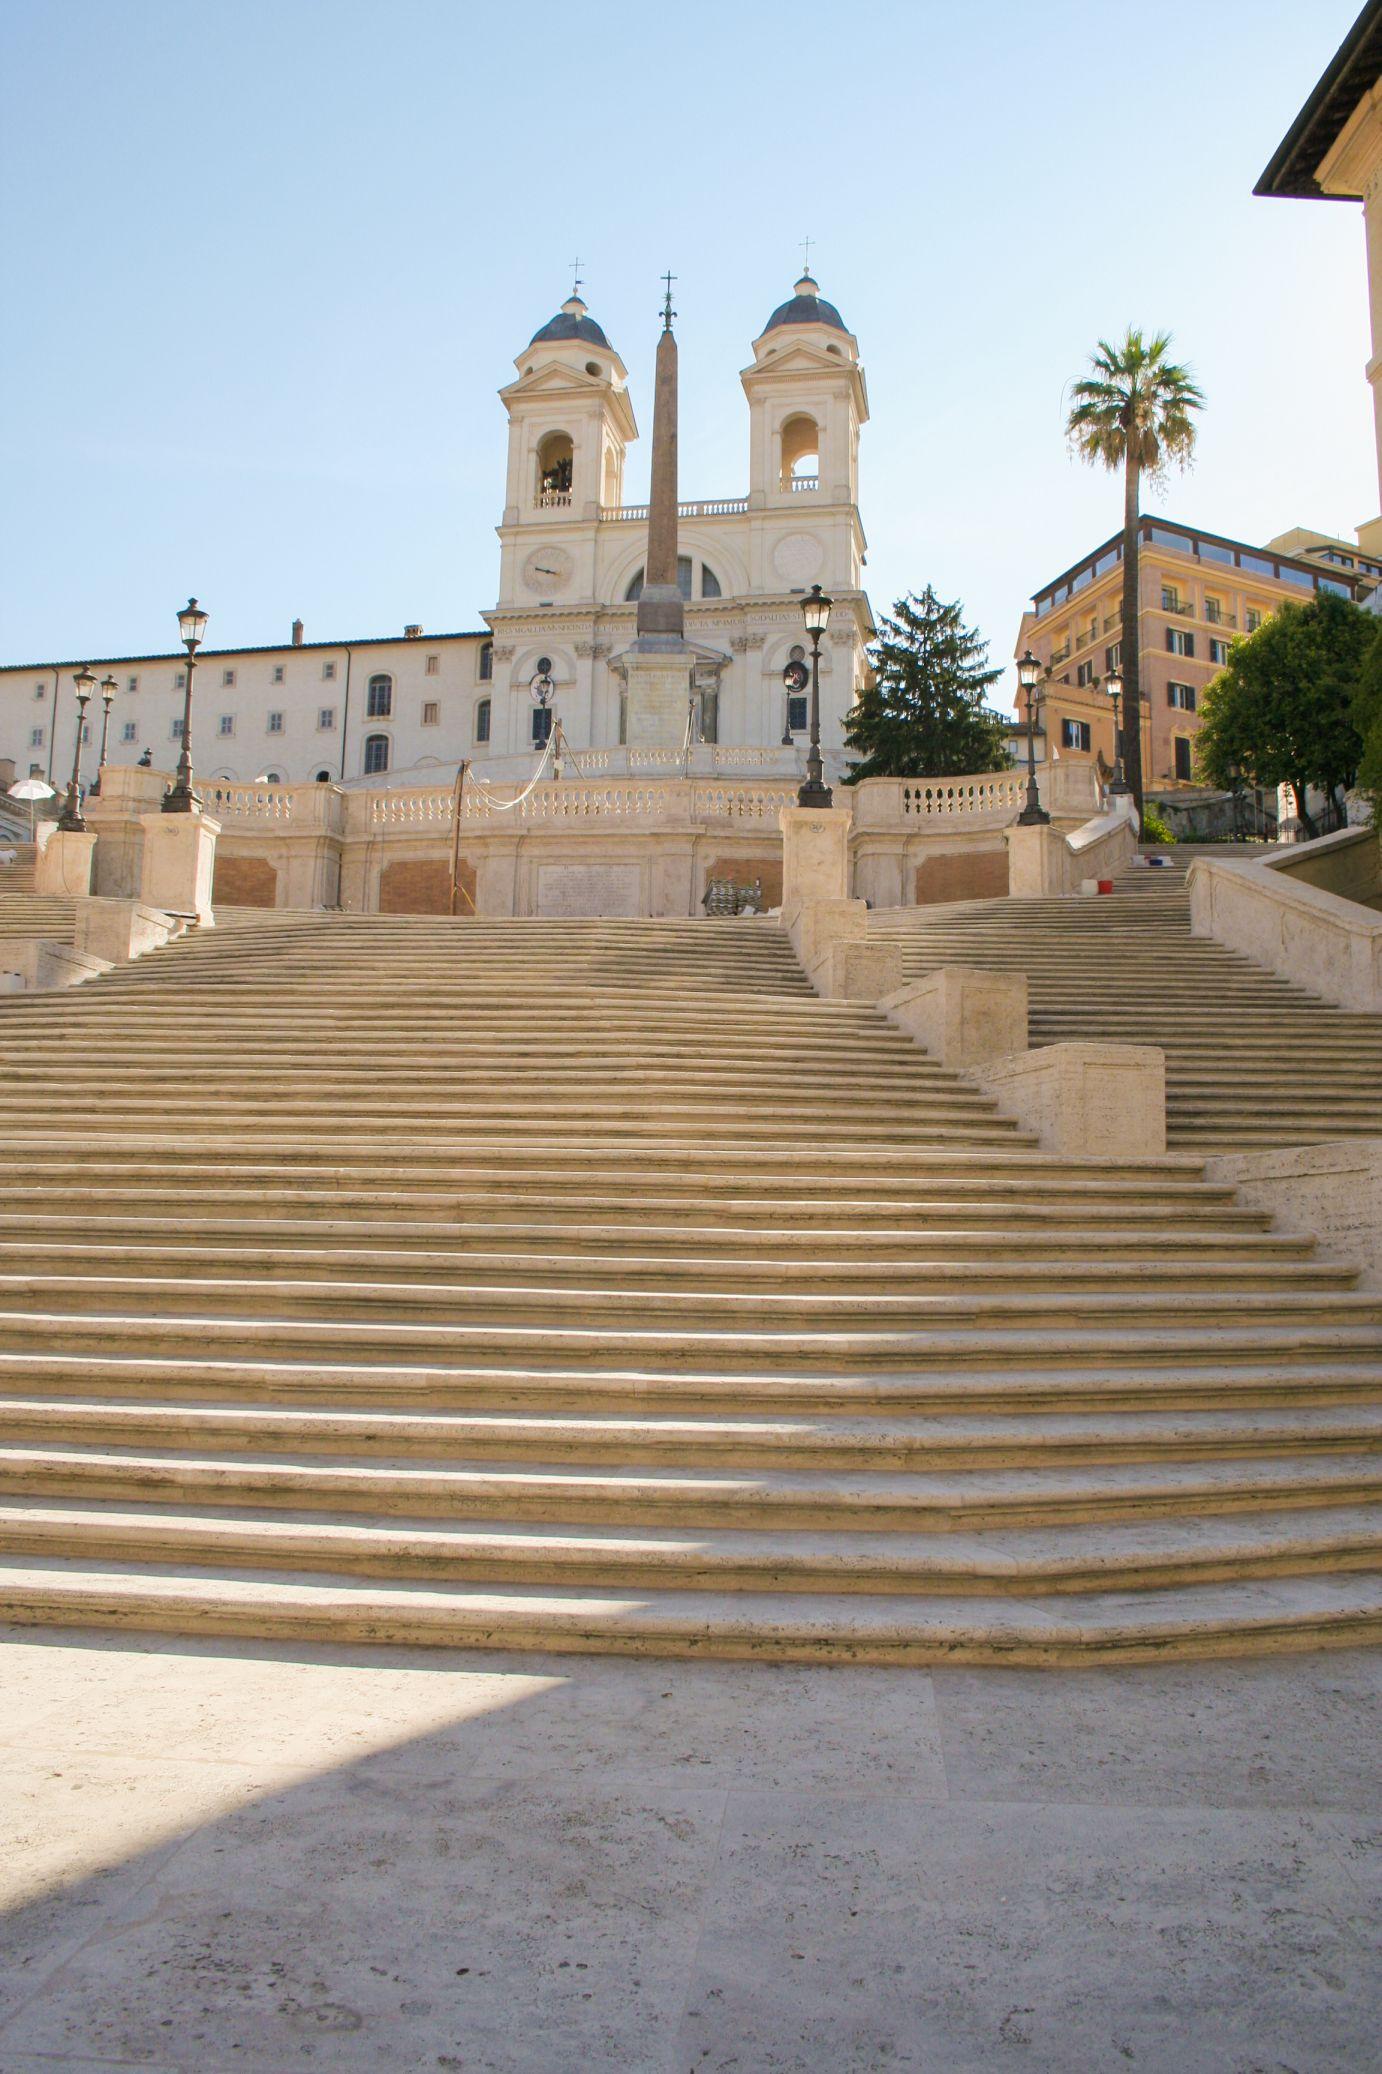 Ritka pillanat, szinte üres a lépcső (Forrás: www.upload.wikimedia.org/wikipedia/commons/5/5e/La_Trinit%C3%A9_des_Monts.jpg)